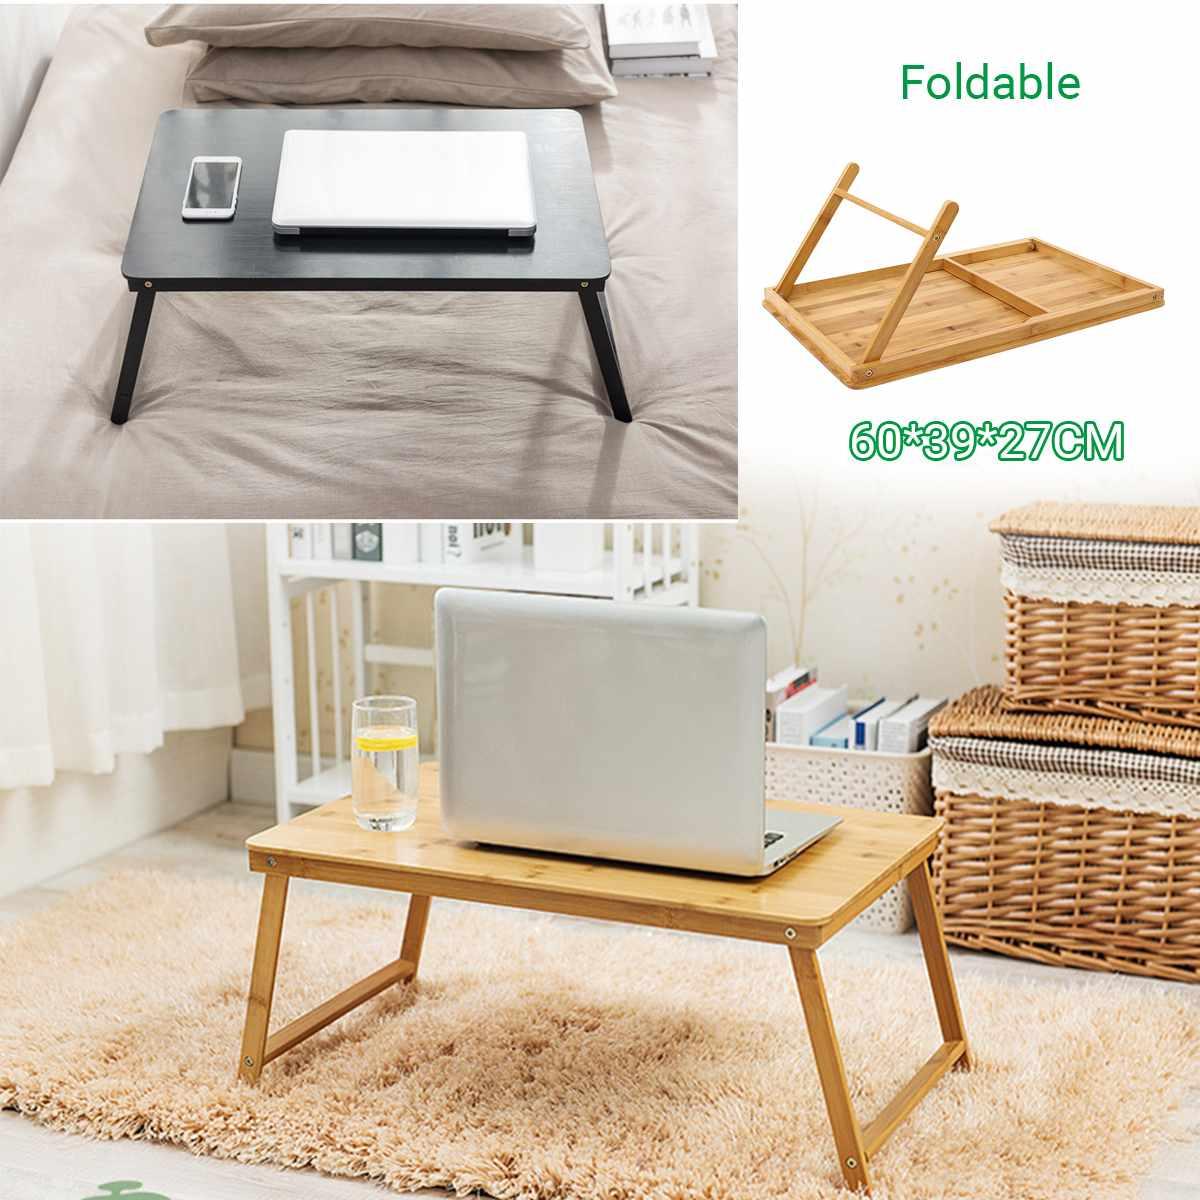 Folding Table Desk Portable Wood Computer Desk Kids Study Living Room Bedroom In Bed/ Sofa/ Floor Outdoor Desk Coffe Tea Table